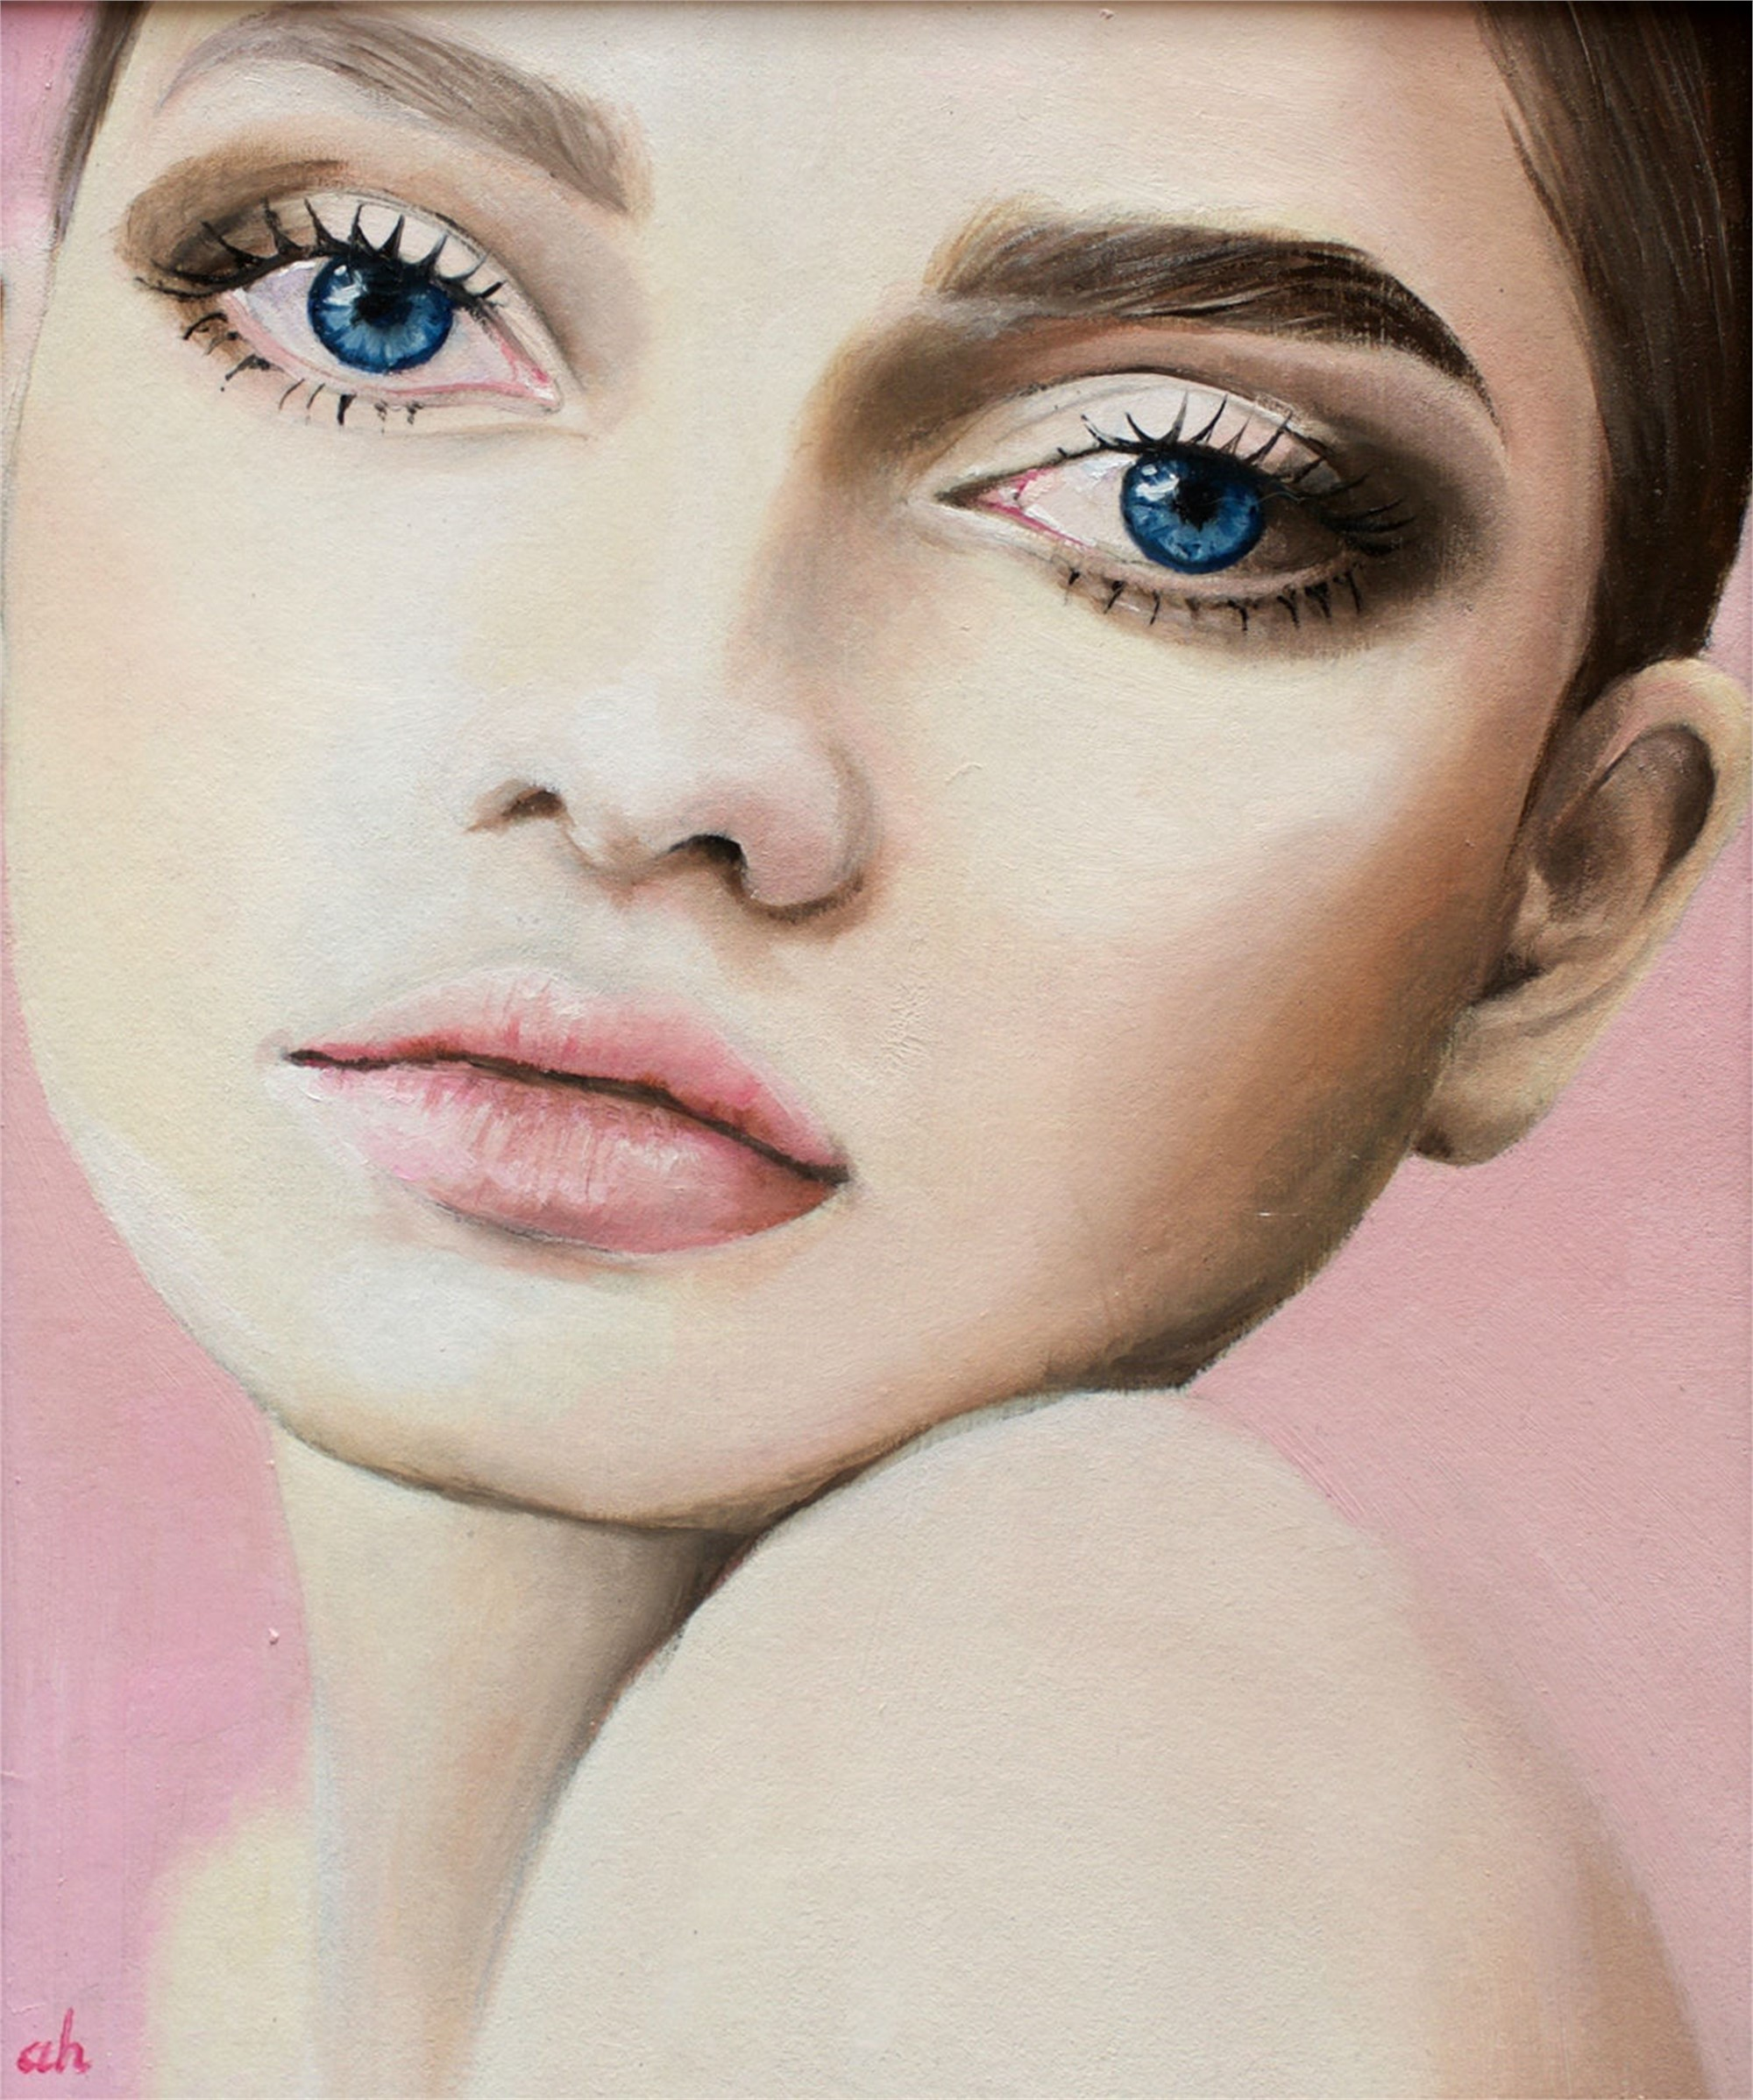 Kat 1 by Anna Hammer